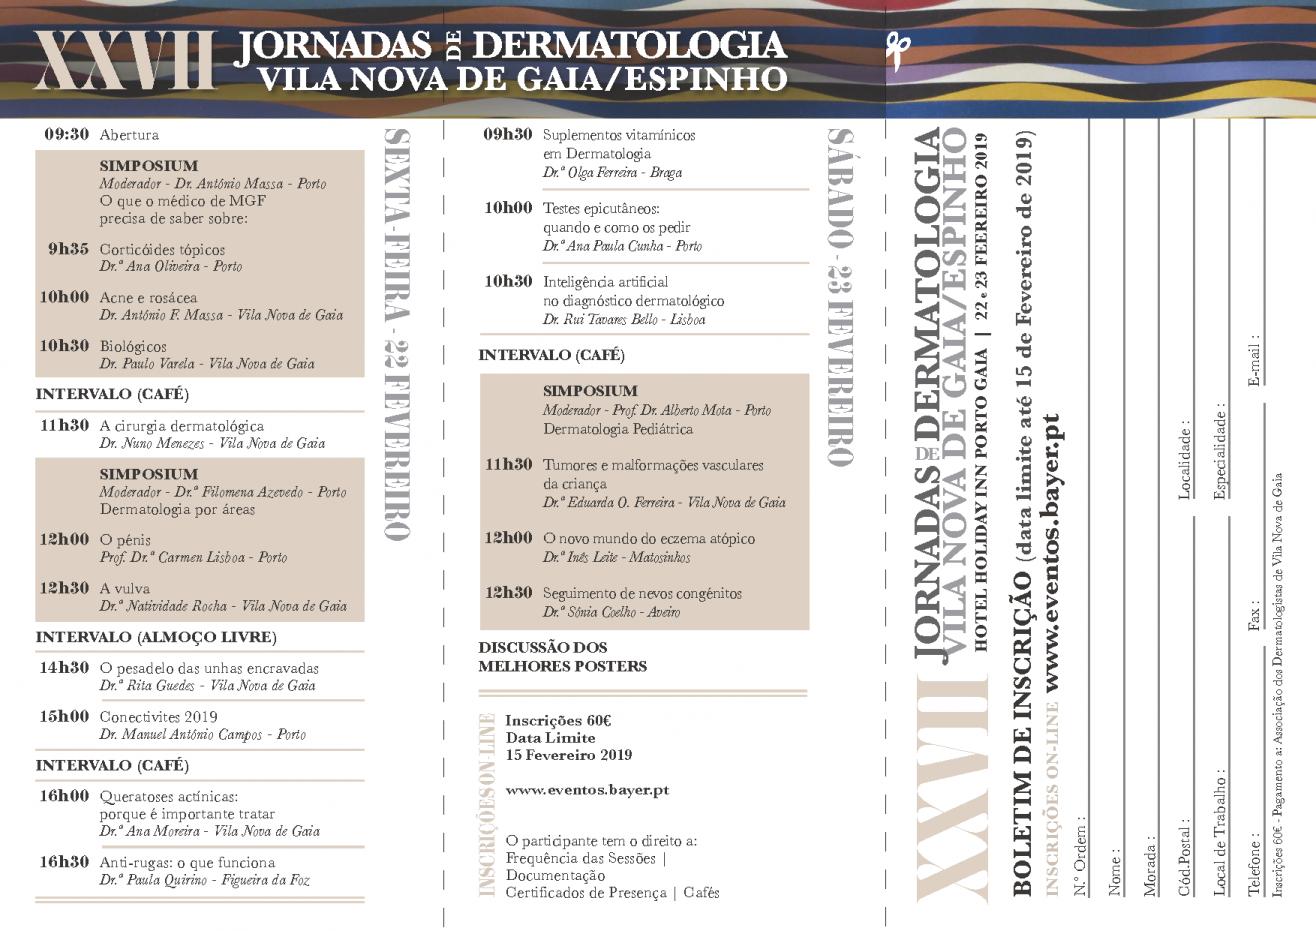 Programa XXVII Jornadas